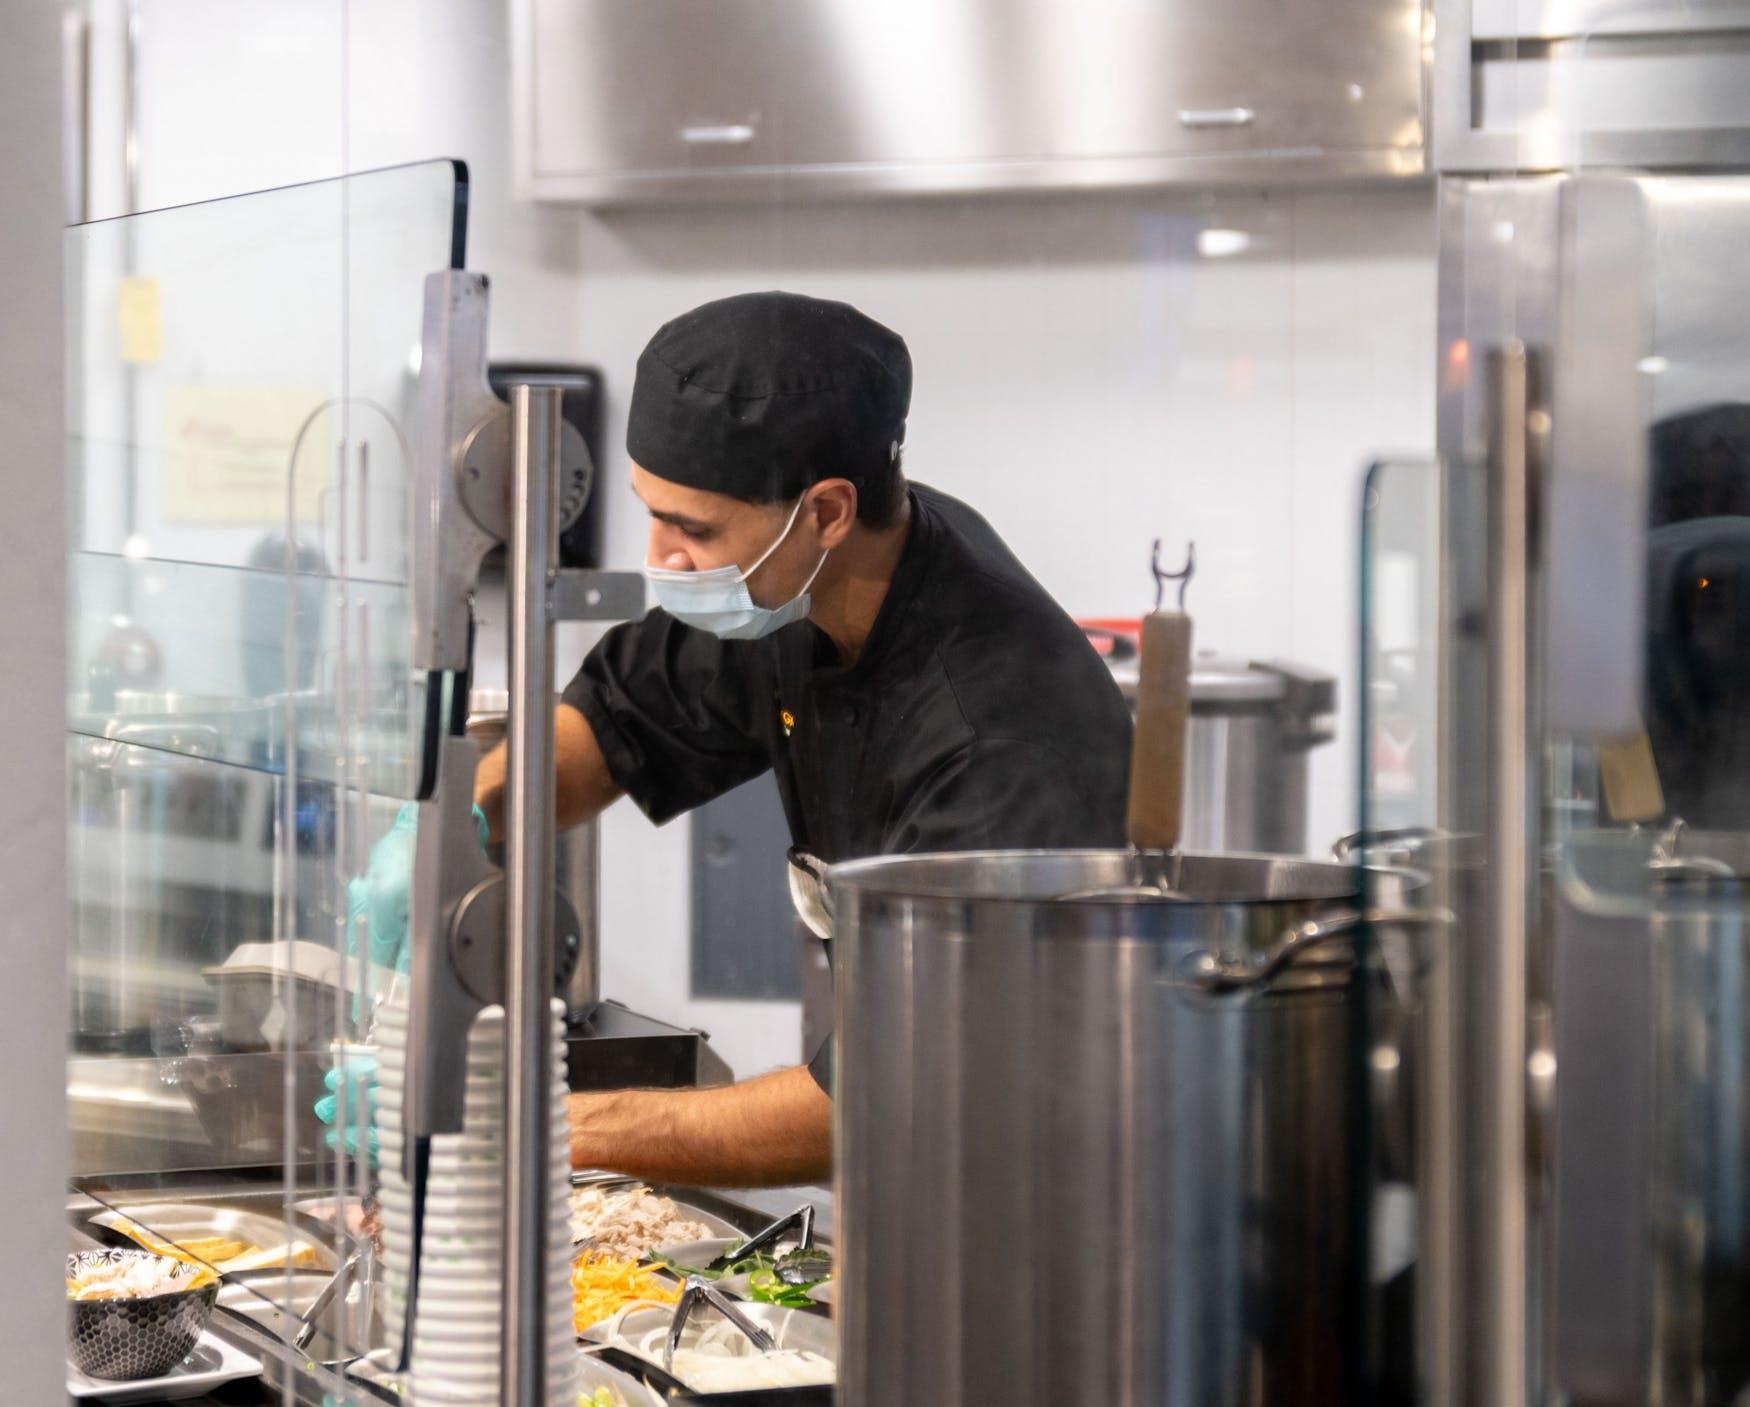 Dining Halls 9.17.20 NZ 0152.jpg